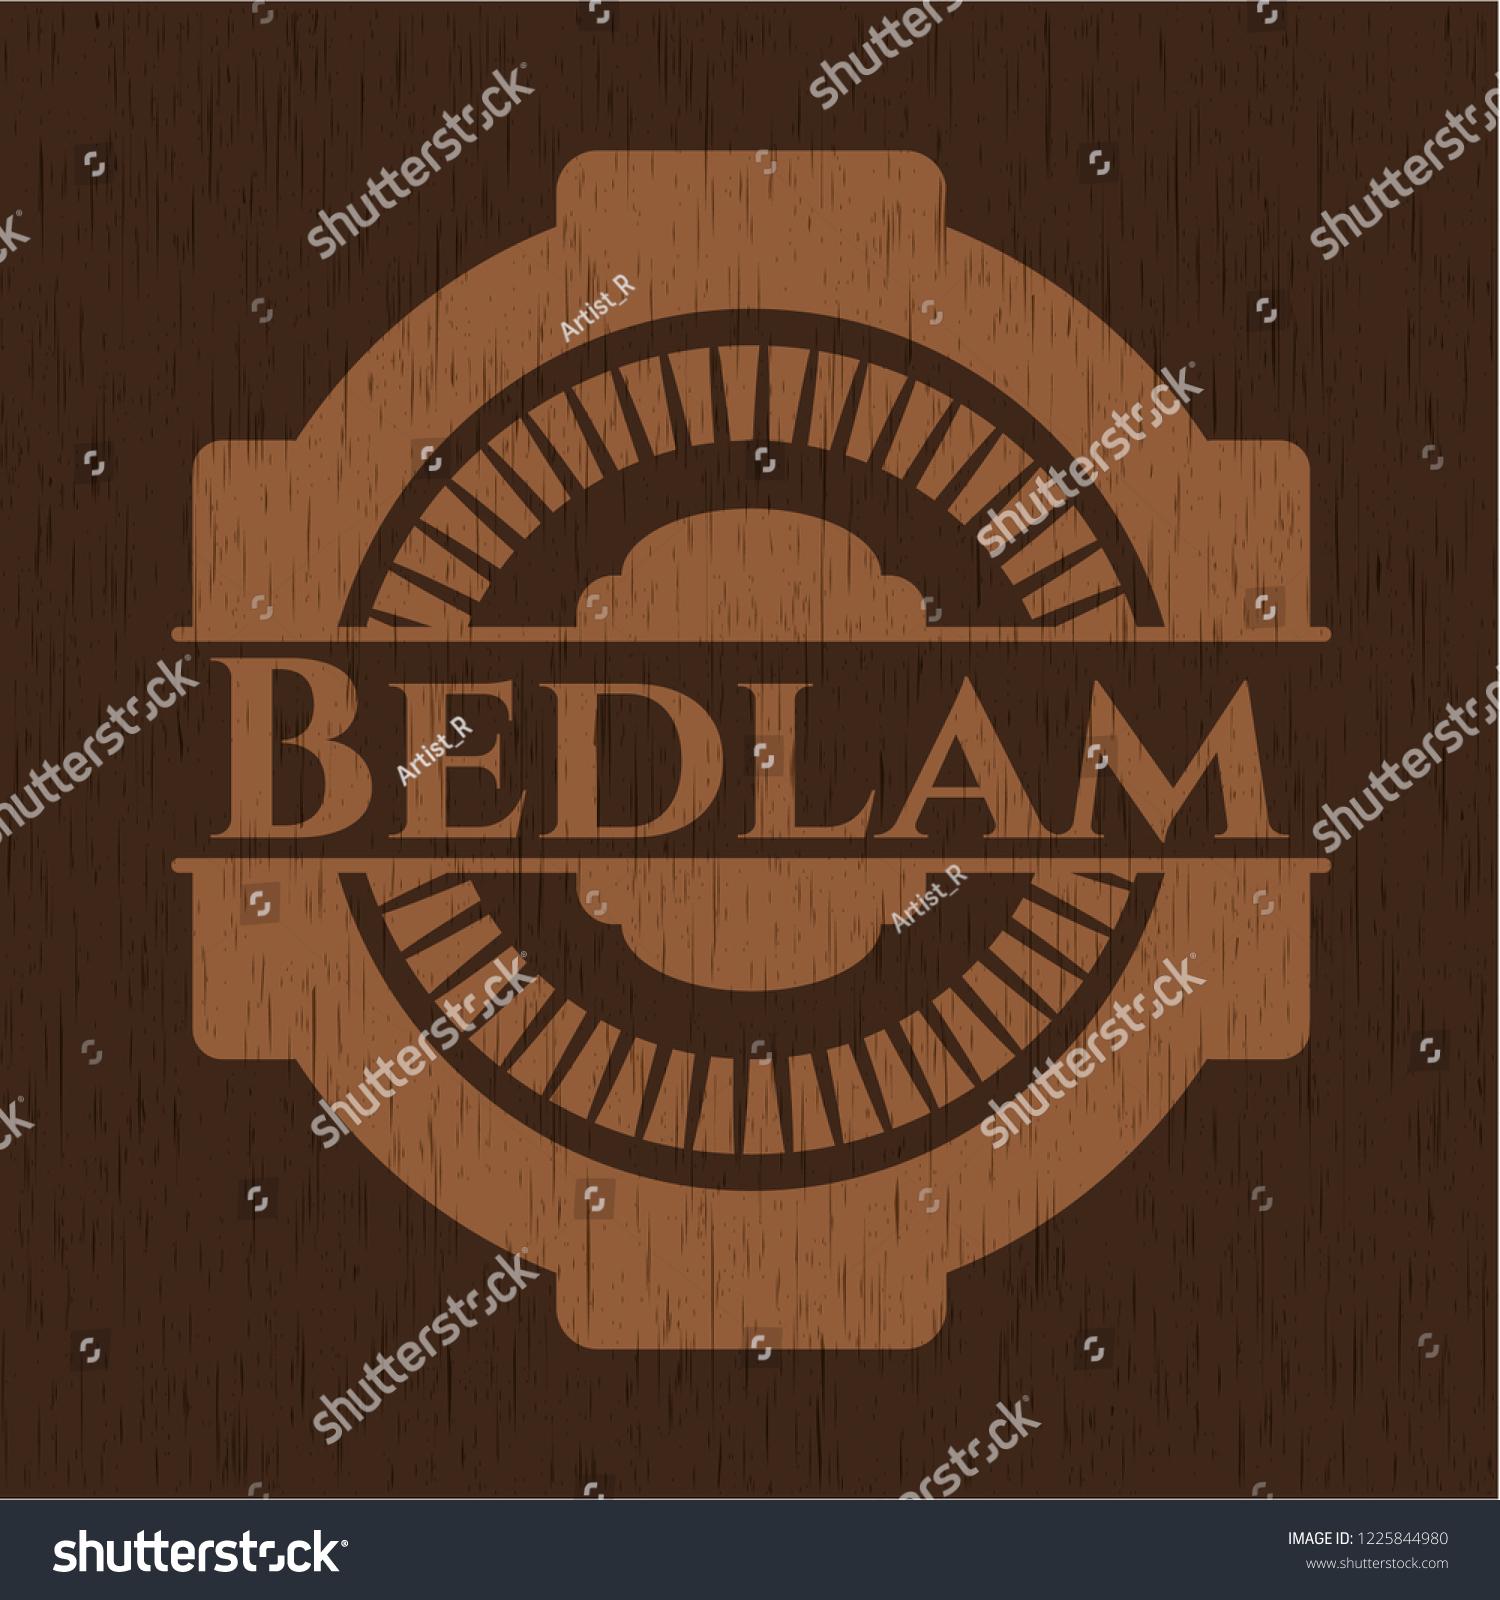 Bedlam Badge Wooden Background Stock Vector Royalty 1225844980 1500x1600